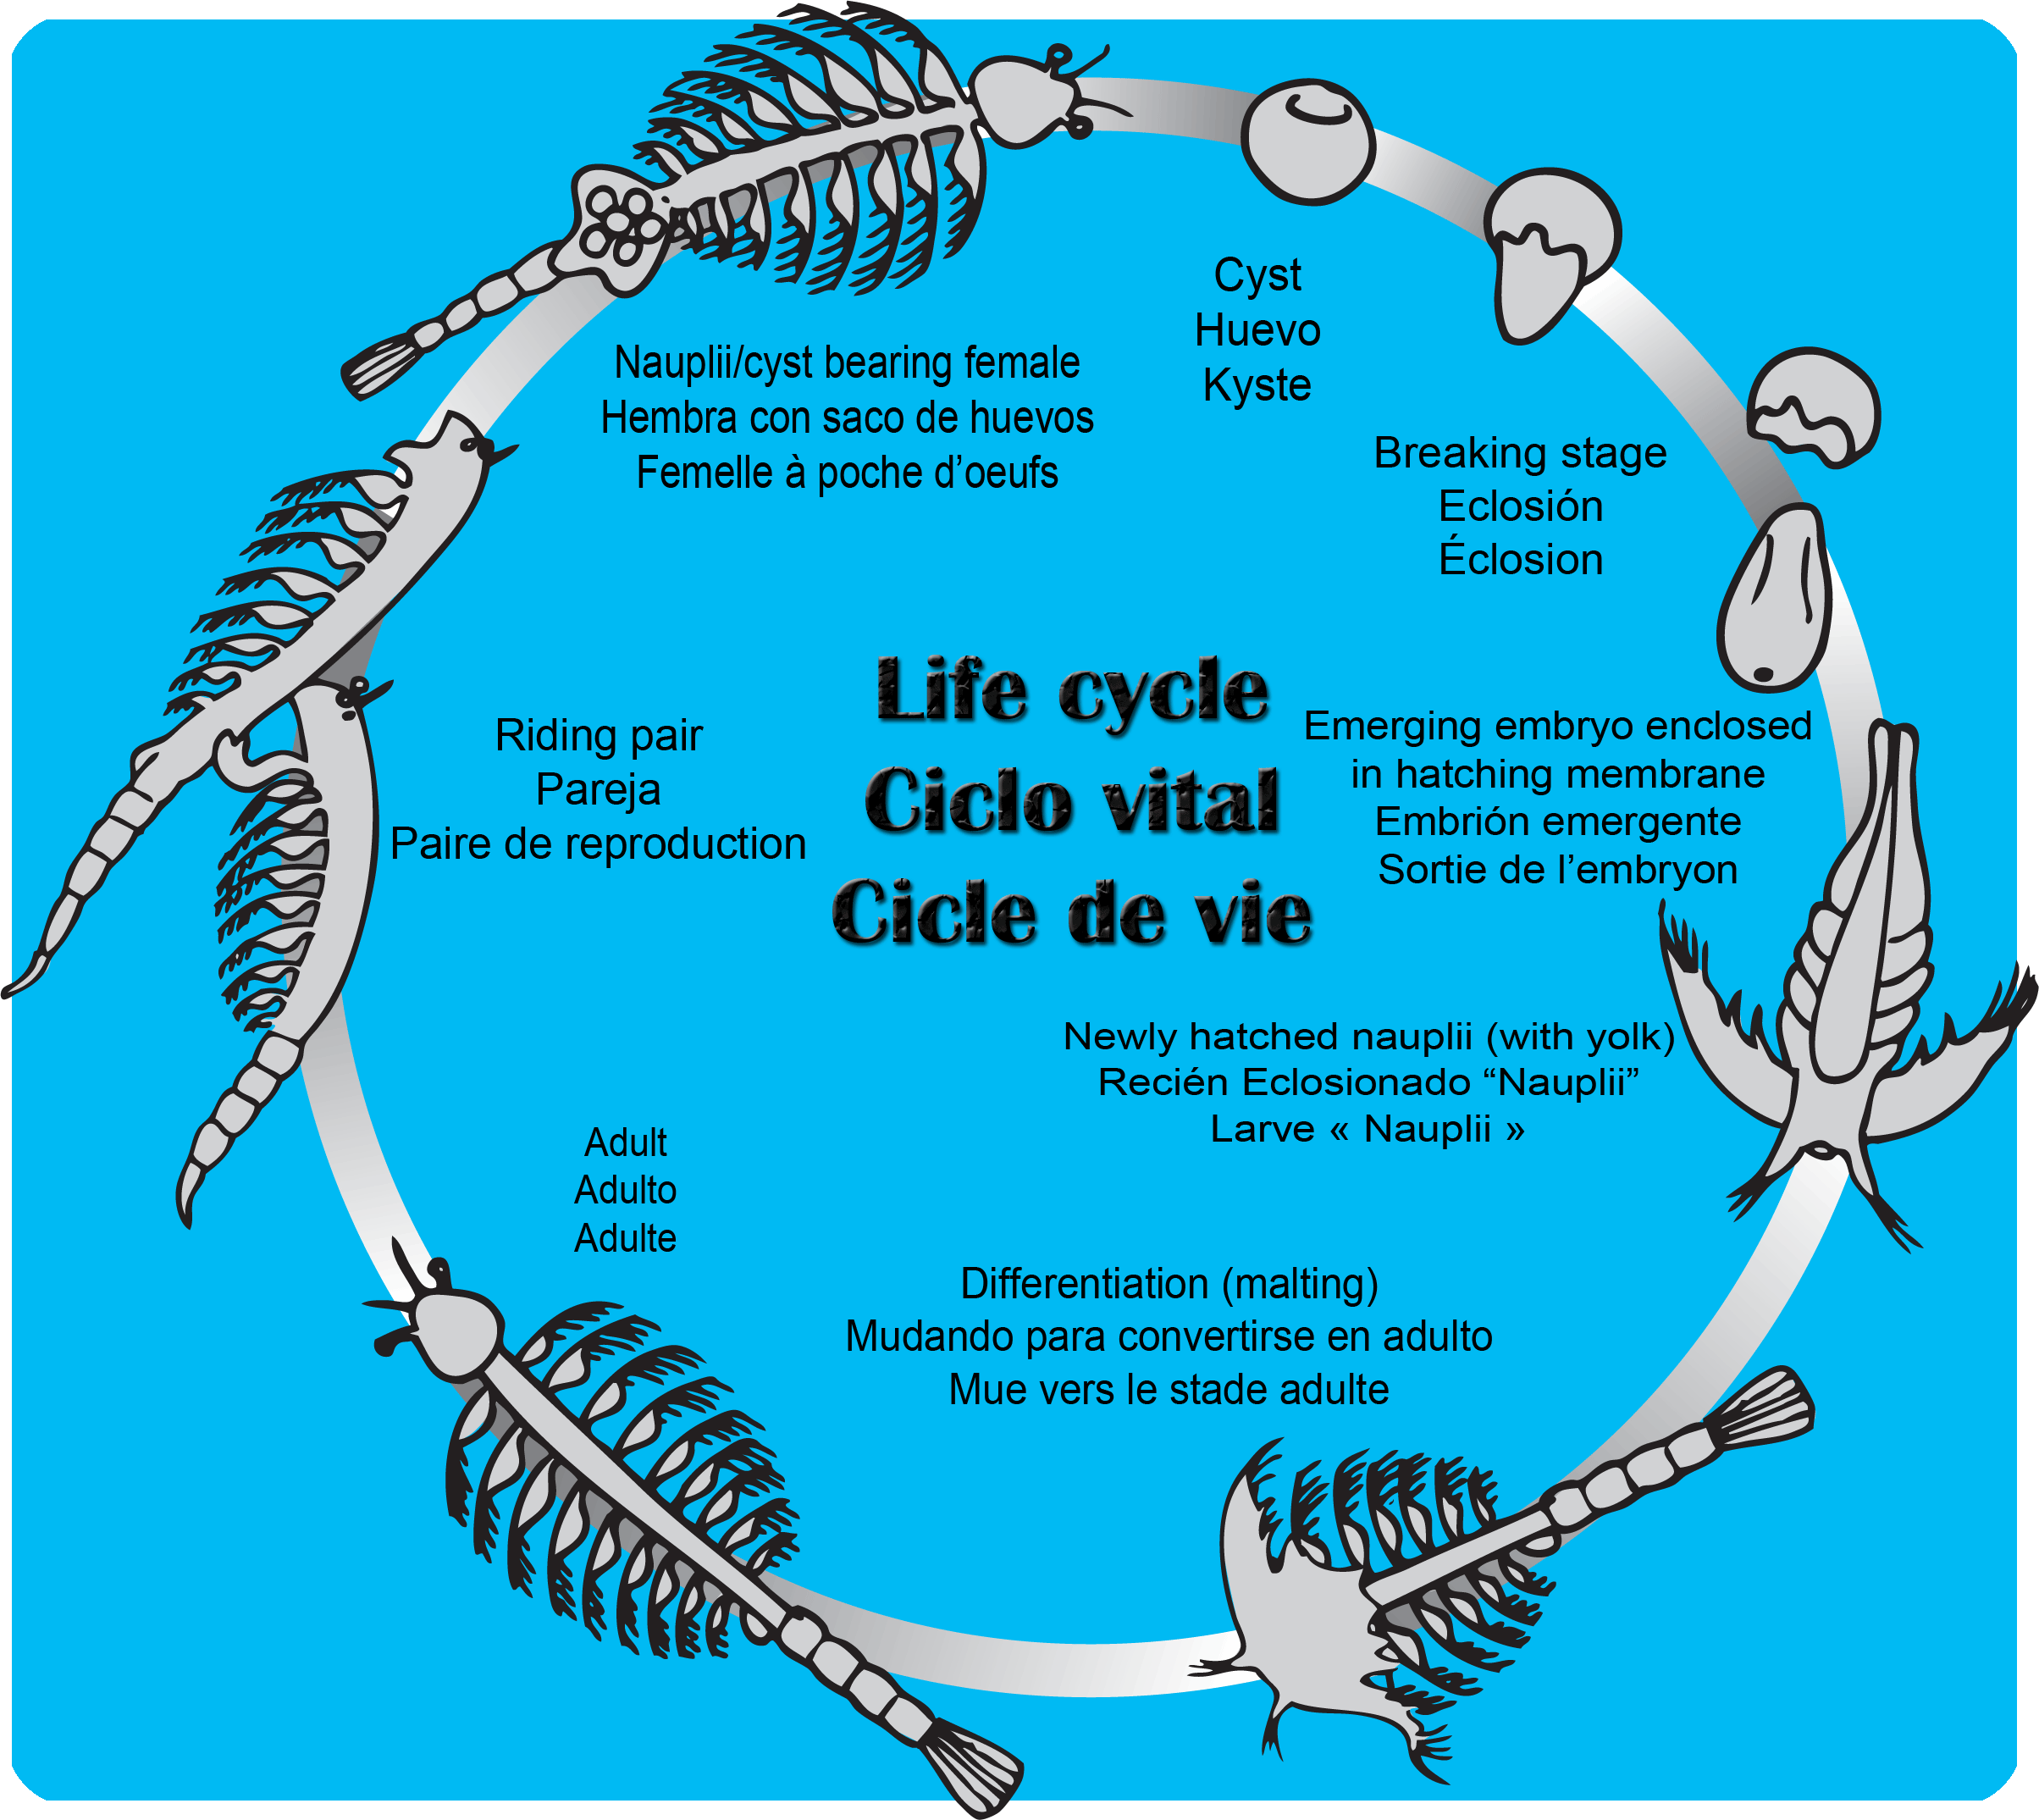 This Is The Life Cycle Of An Aqua Dragon A K A Artemia Salina Www Aquadragons Net Sea Monkeys Aqua Fishing Room